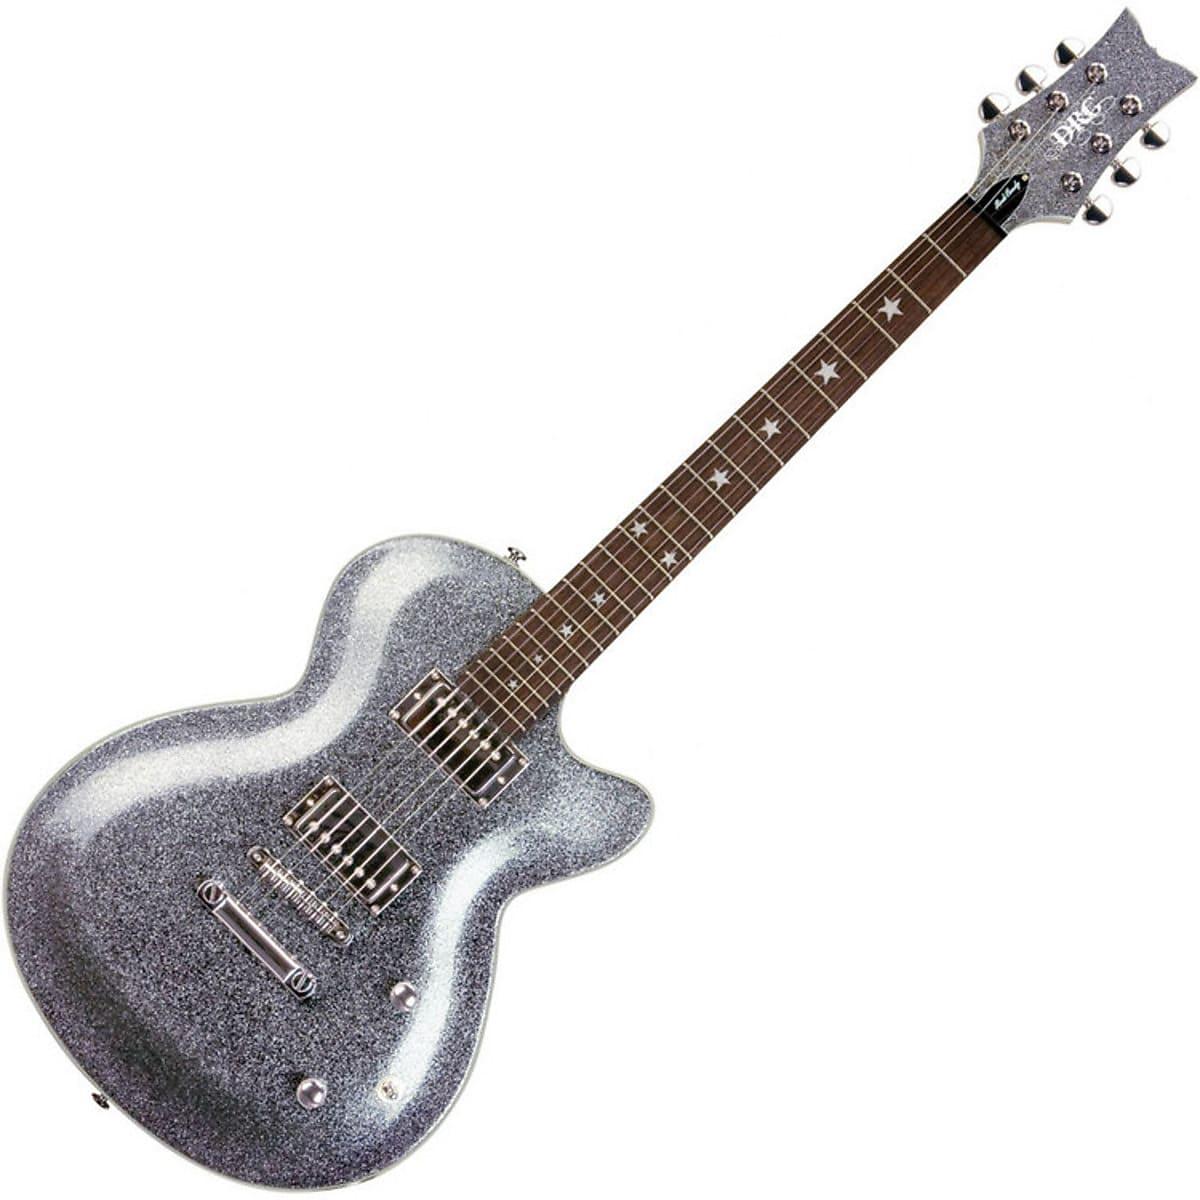 Daisy Rock DR6759 Rock Candy Classic Singlecut Electric Guitar Platinum Sparkle